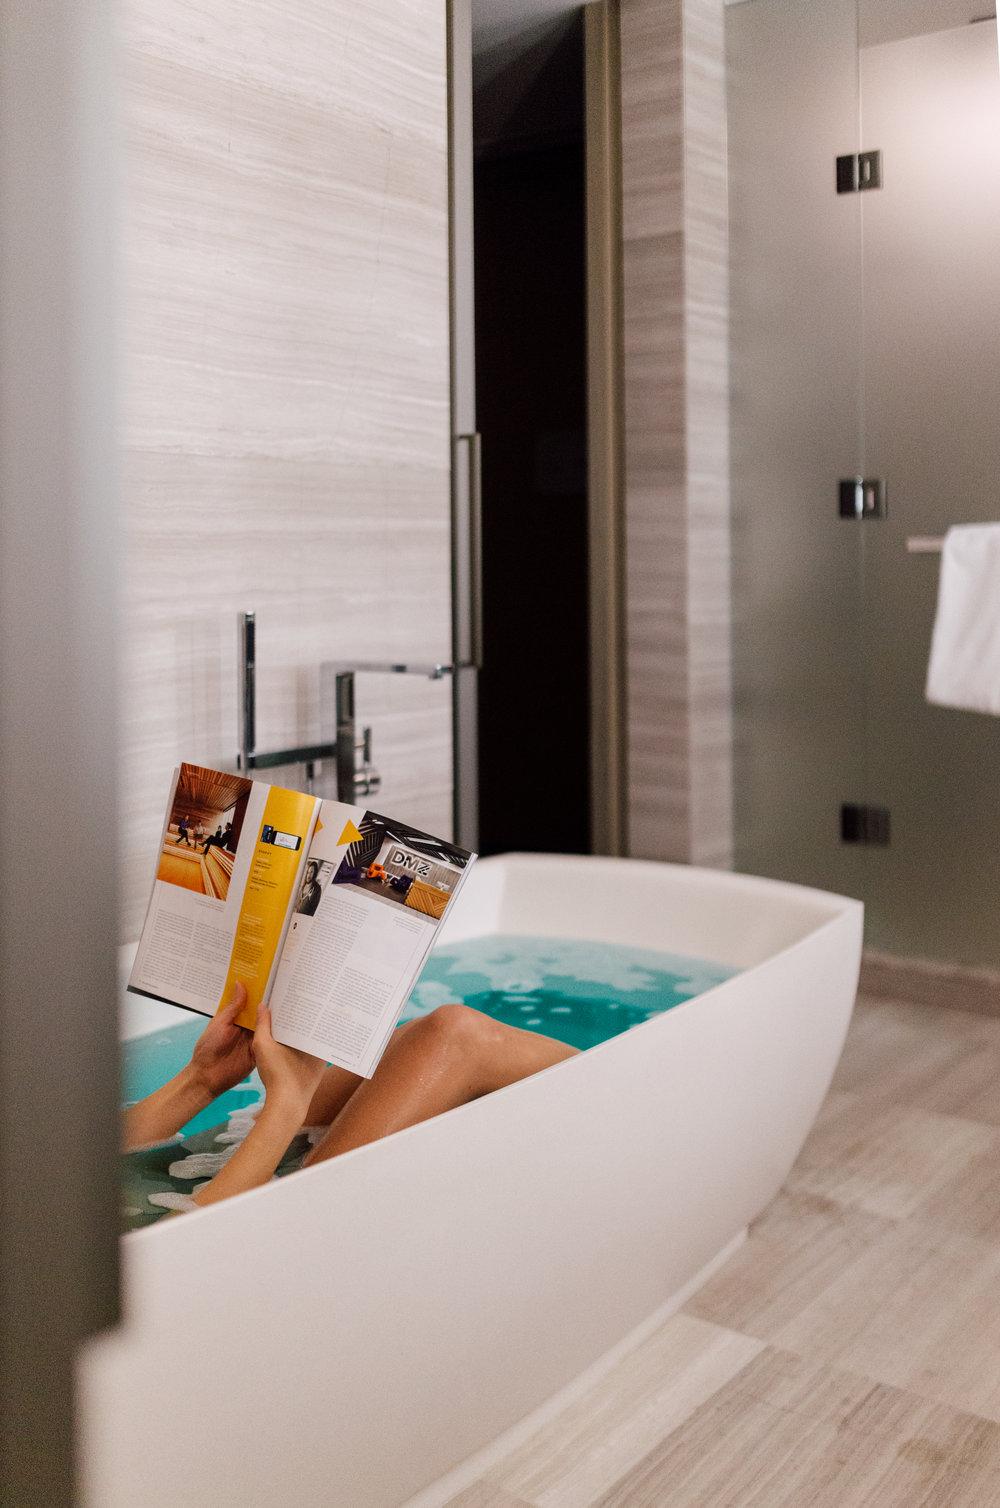 Tan girl in luxury bathtub by a social media photographer